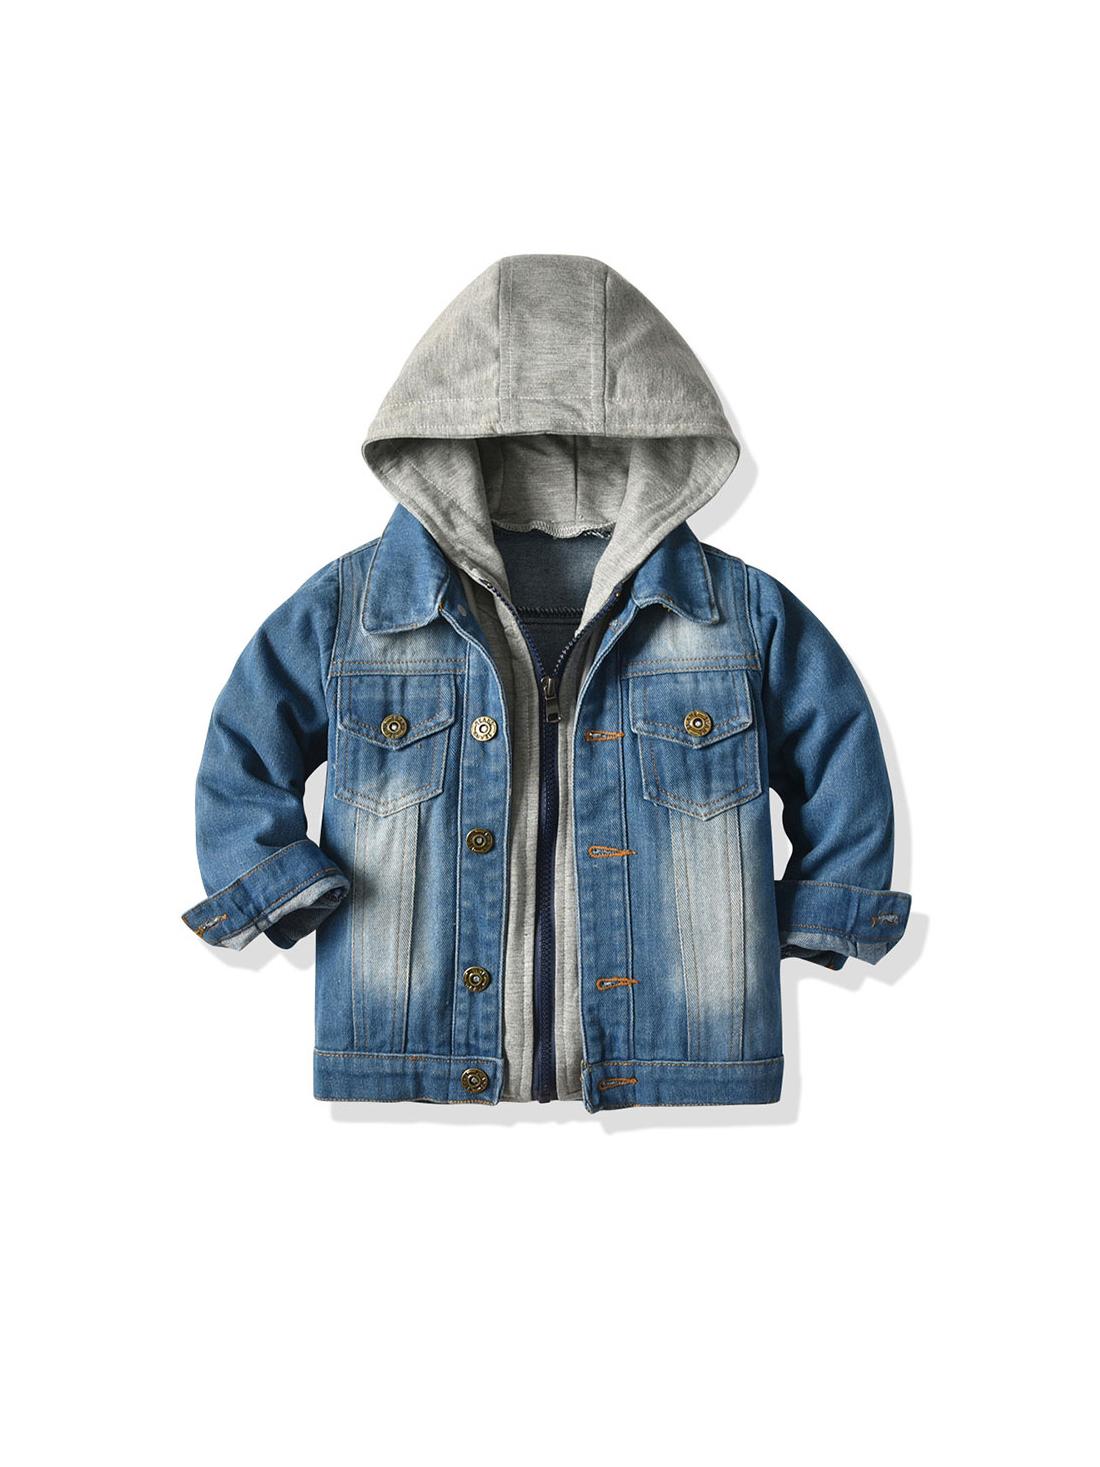 Chic Single-Breasted Boys Long Sleeve Kids Jacket